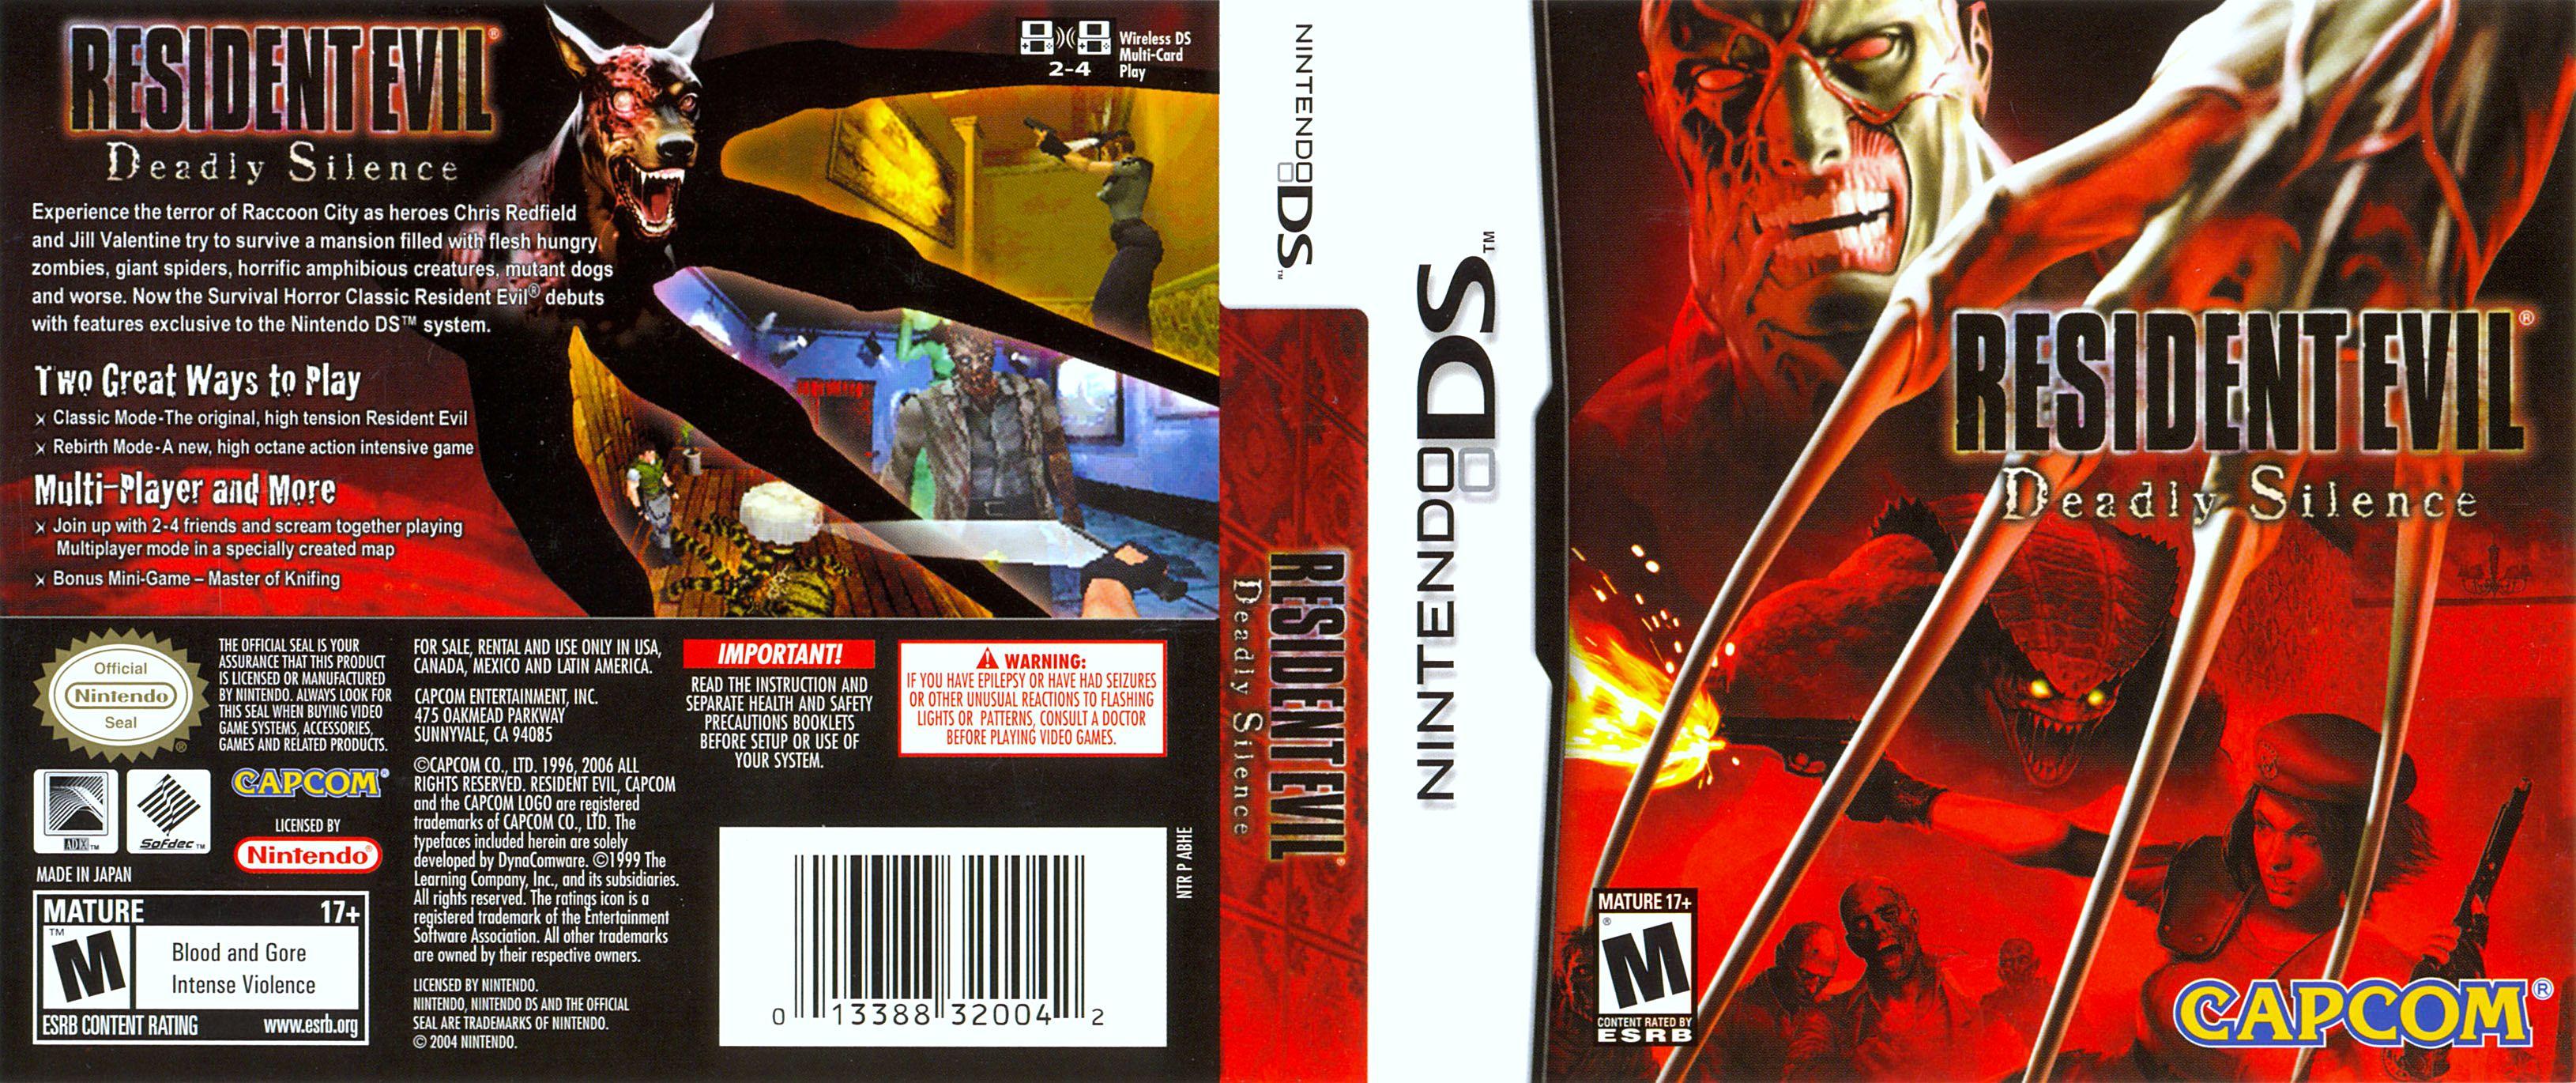 Прохождение Resident Evil: Deadly Silence A963aca9c16f675548d43d7d1c9d0da8